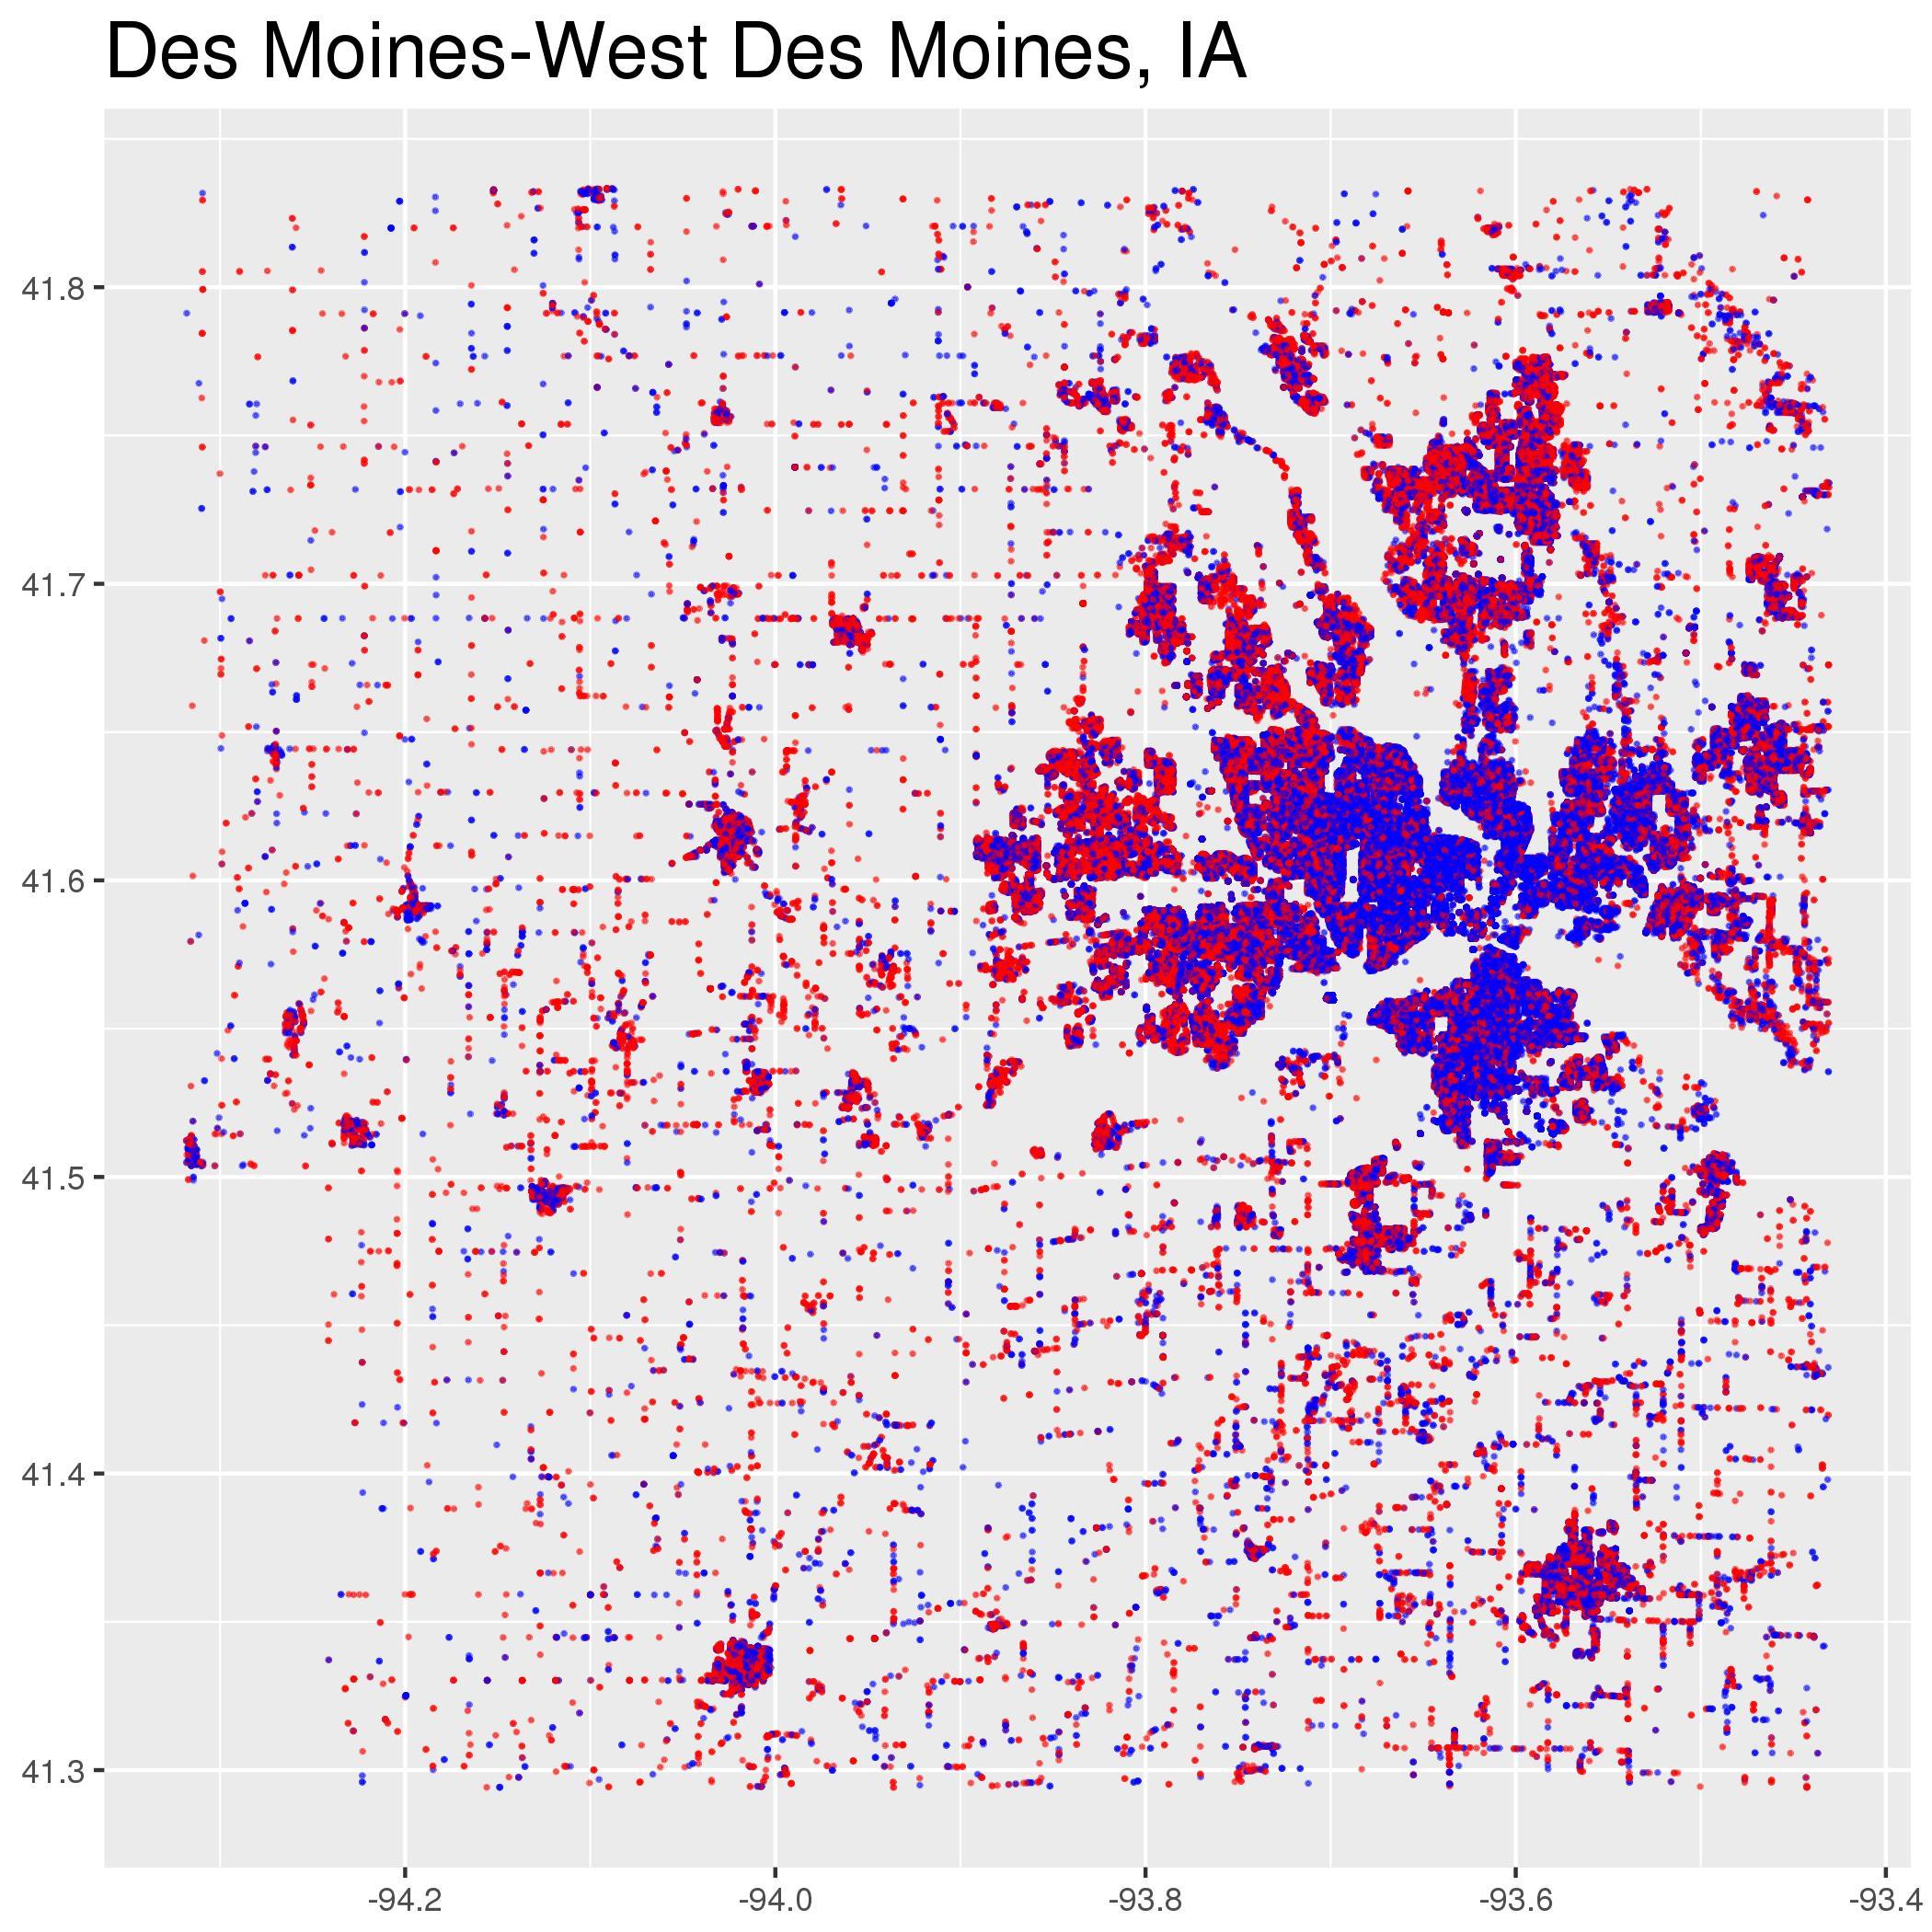 DesMoines-WestDesMoinesIA.jpeg